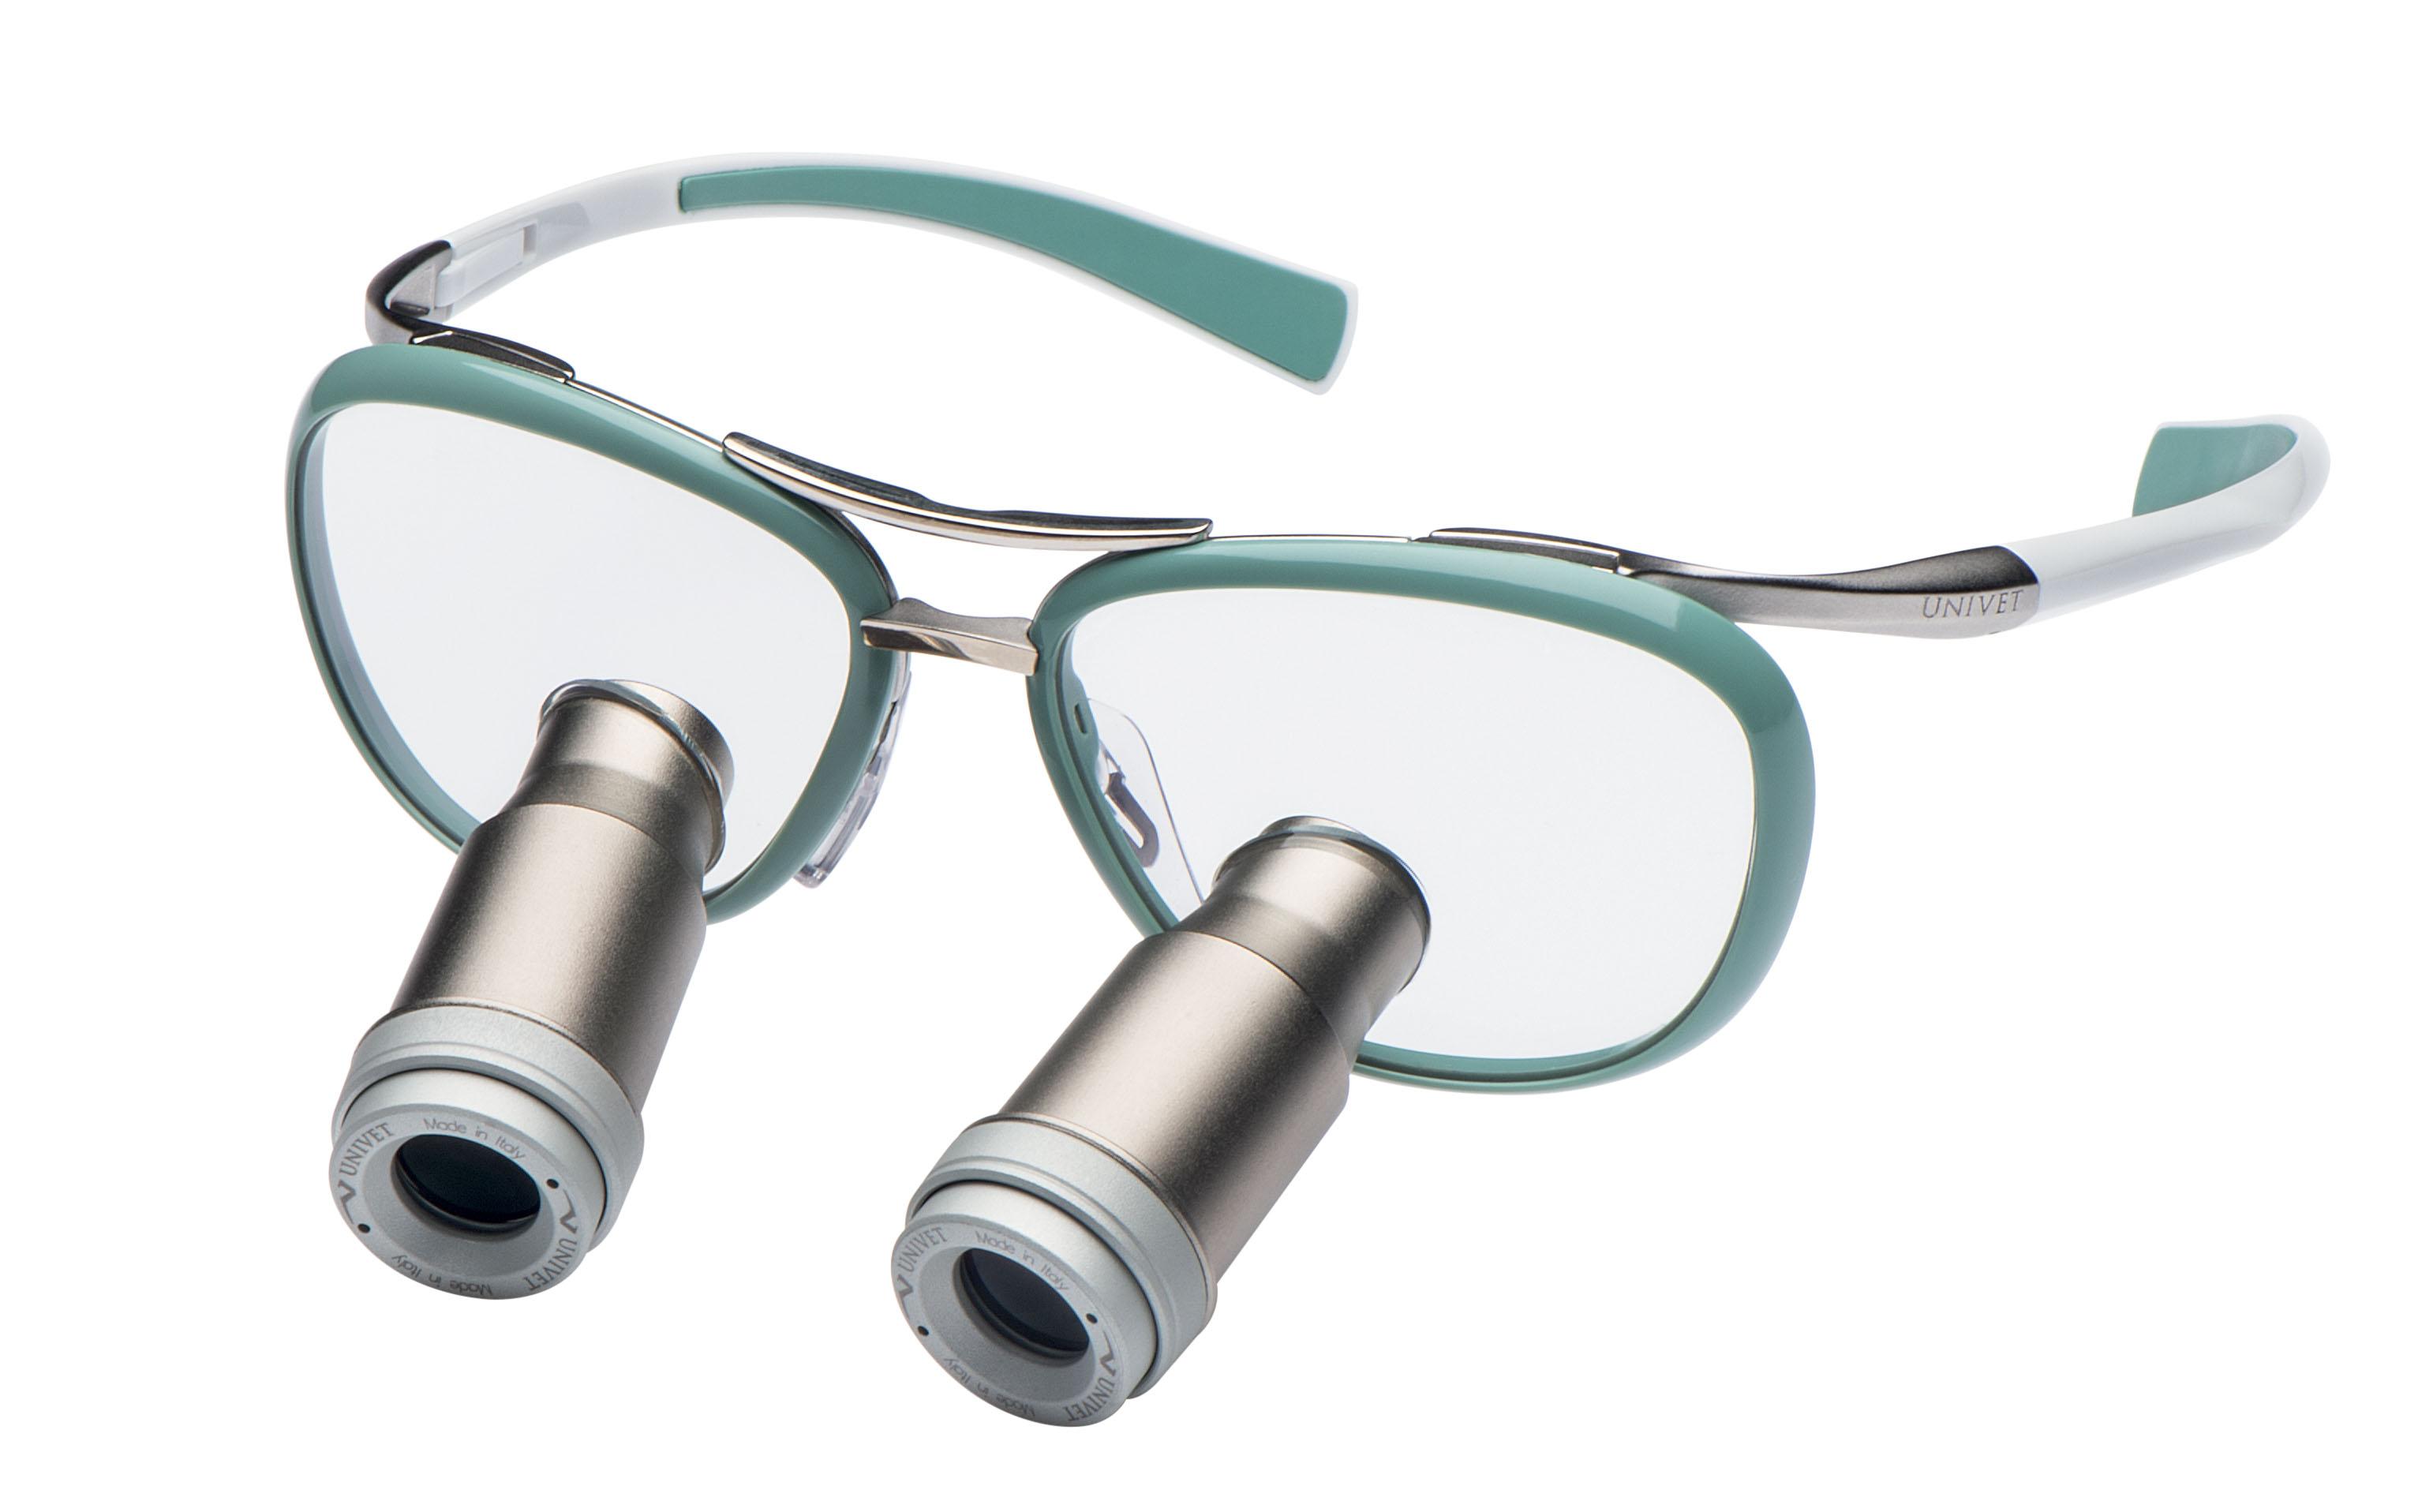 Loepbril met prisma loep